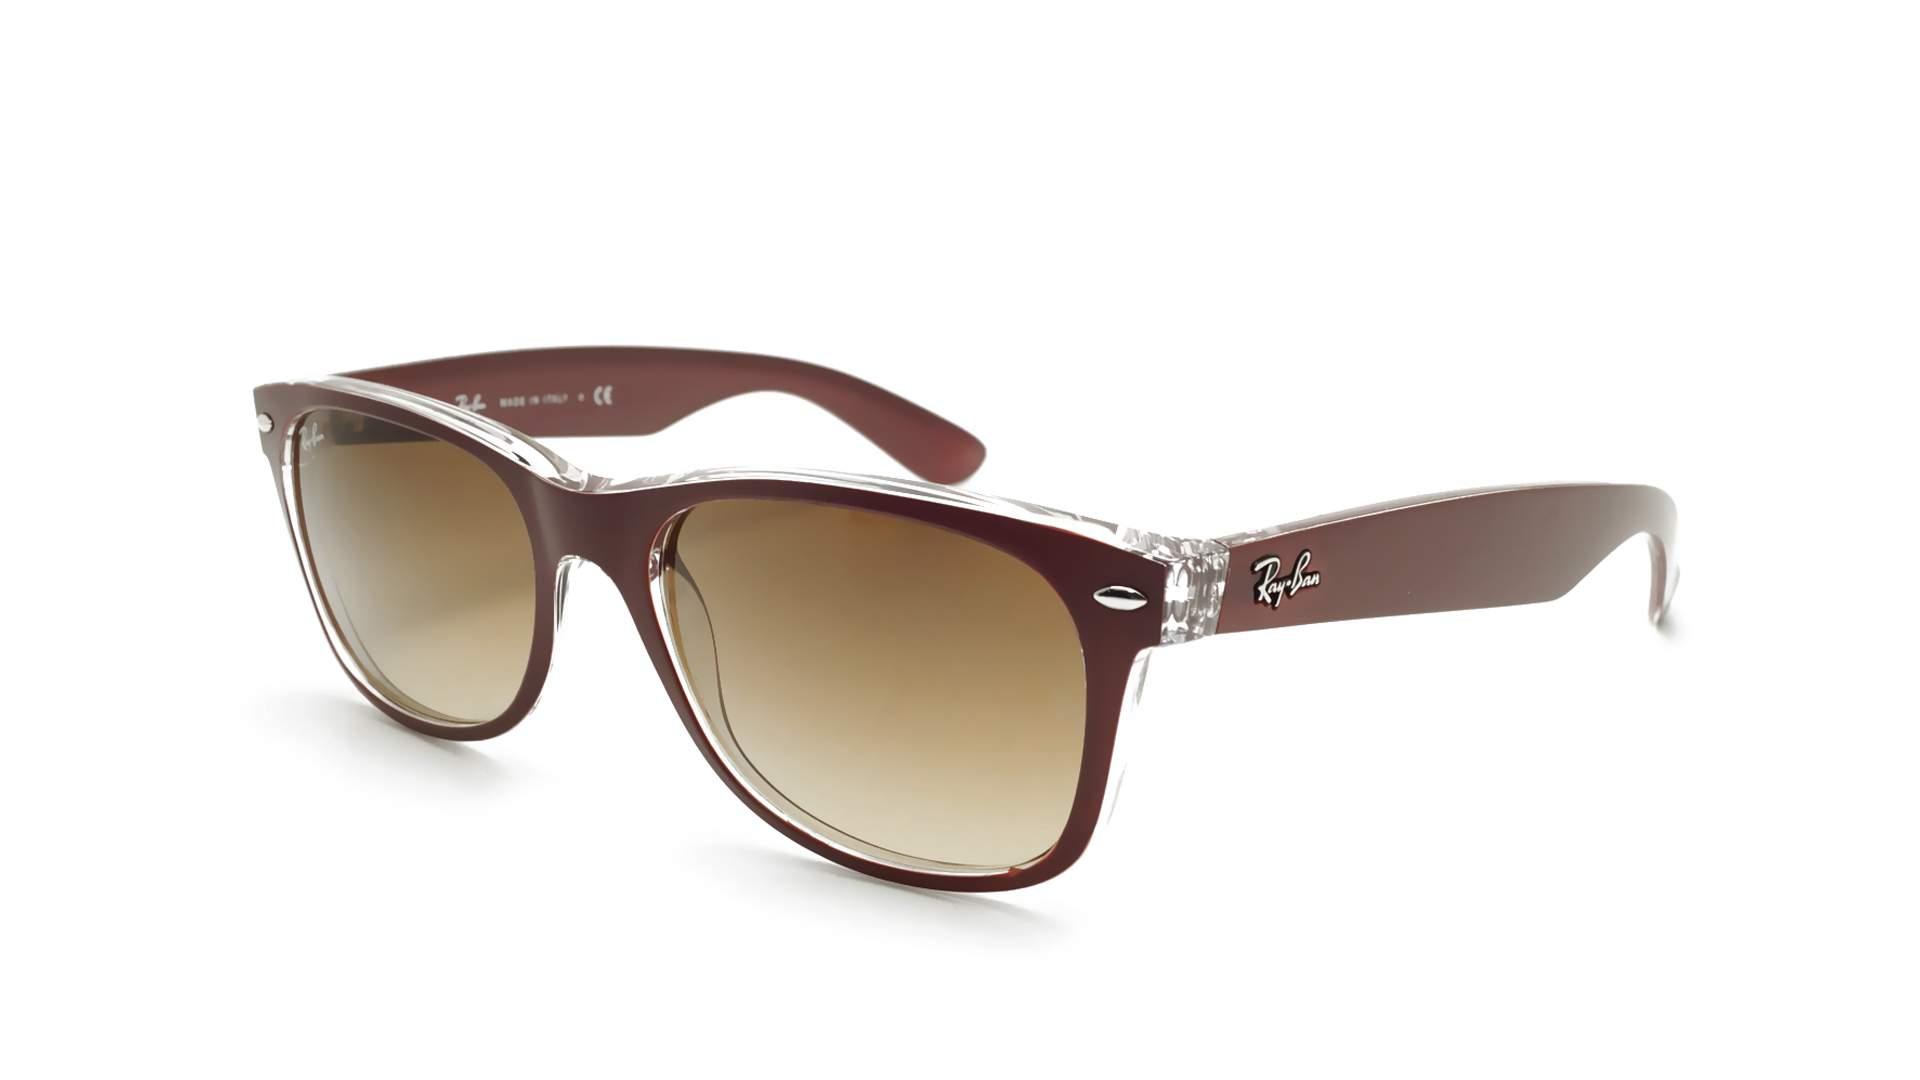 1cf418c8da Sunglasses Ray-Ban New Wayfarer Purple RB2132 6054 85 55-18 Medium Gradient